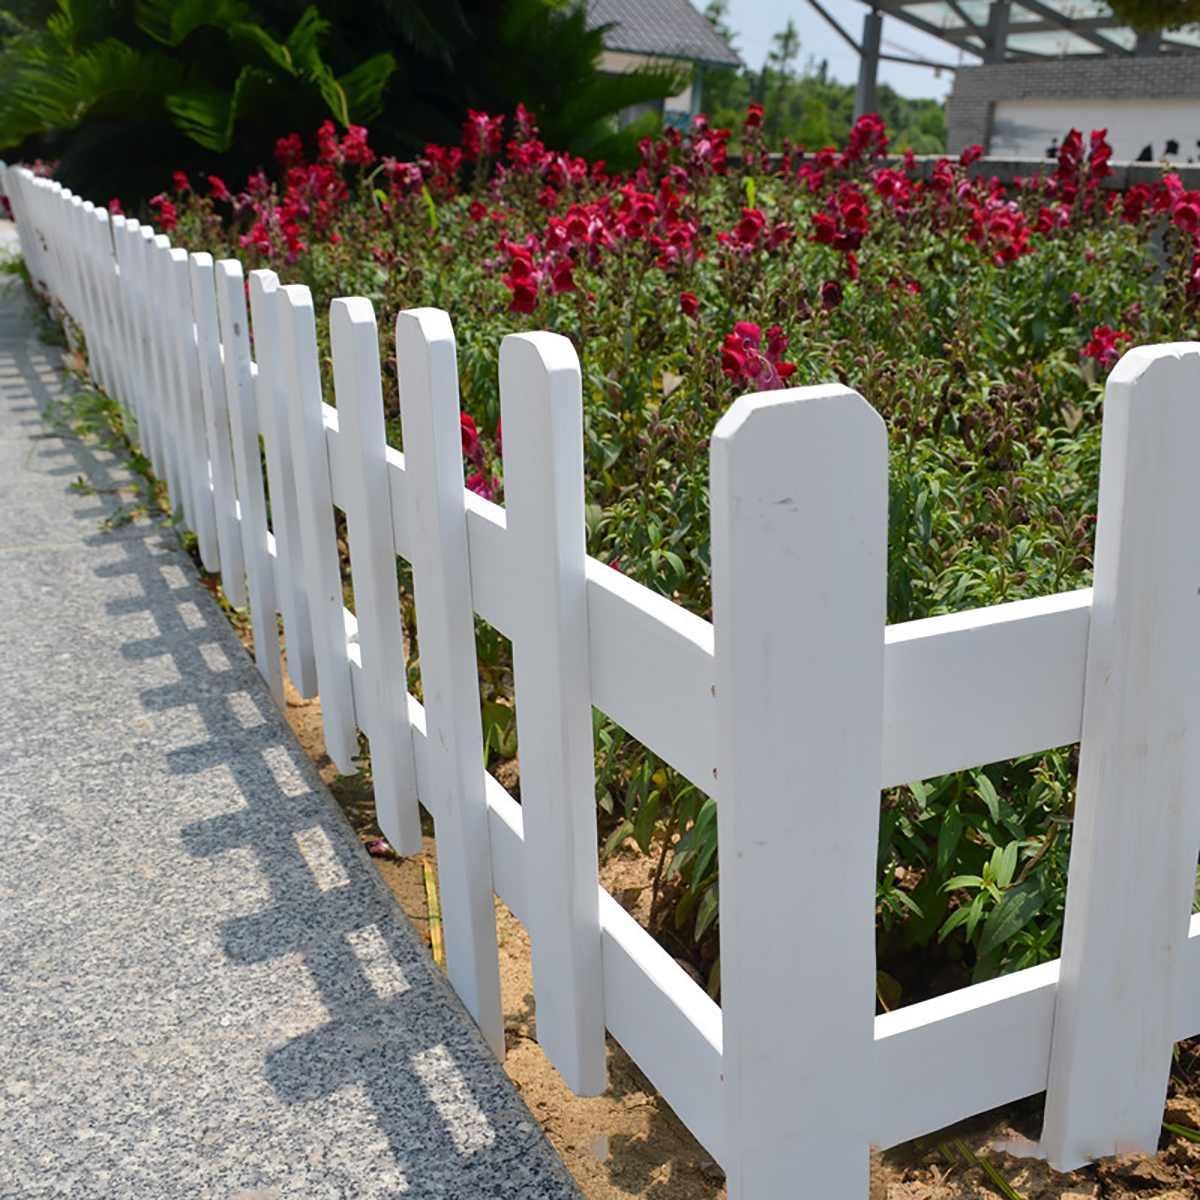 cheapest 20X Interlocked Landscape Edge Garden Side Lawn Edge Pp Fence Lawn Decoration